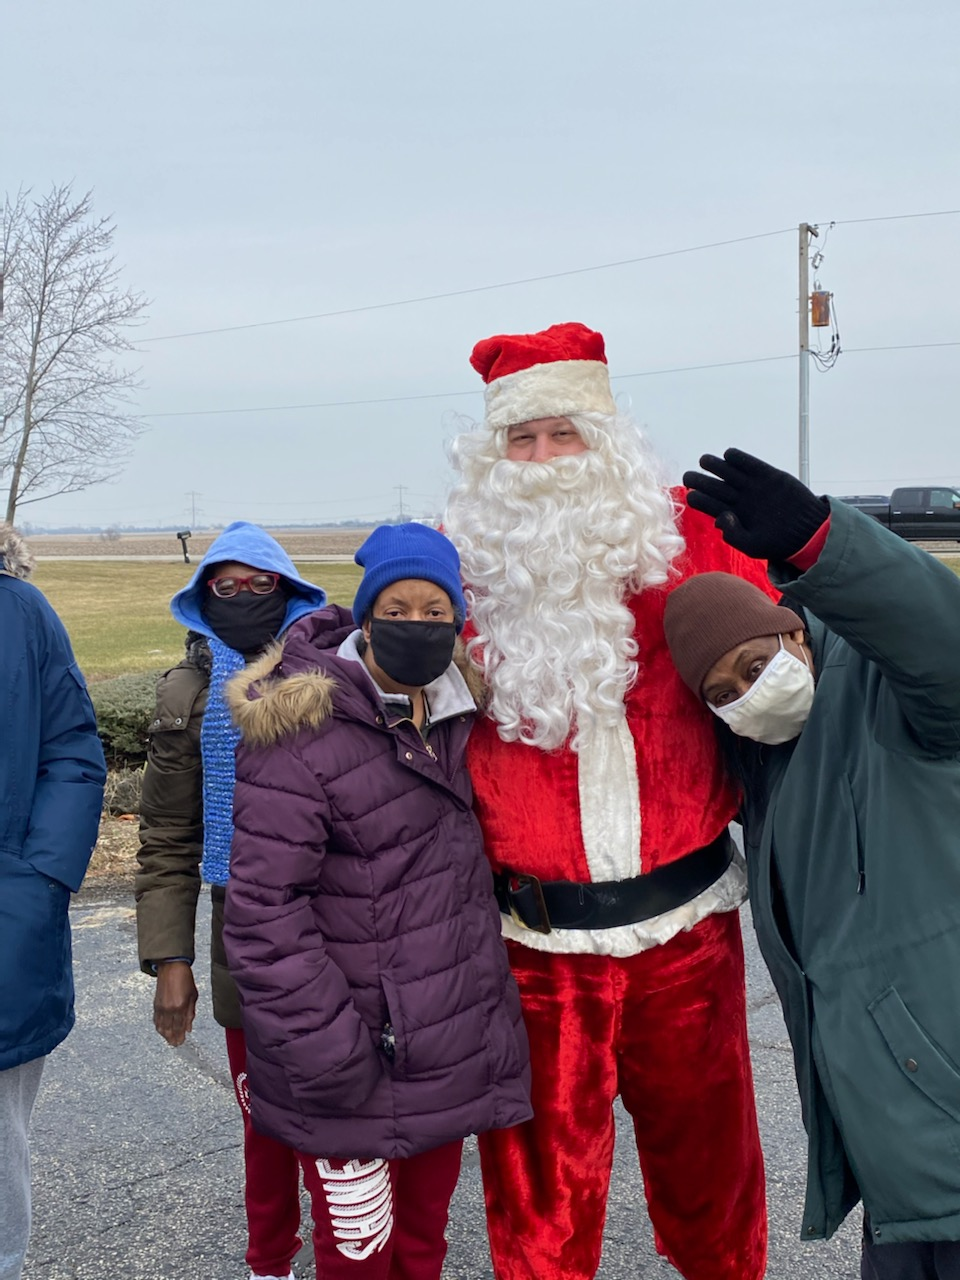 Three women stand beside a man dressed as Santa